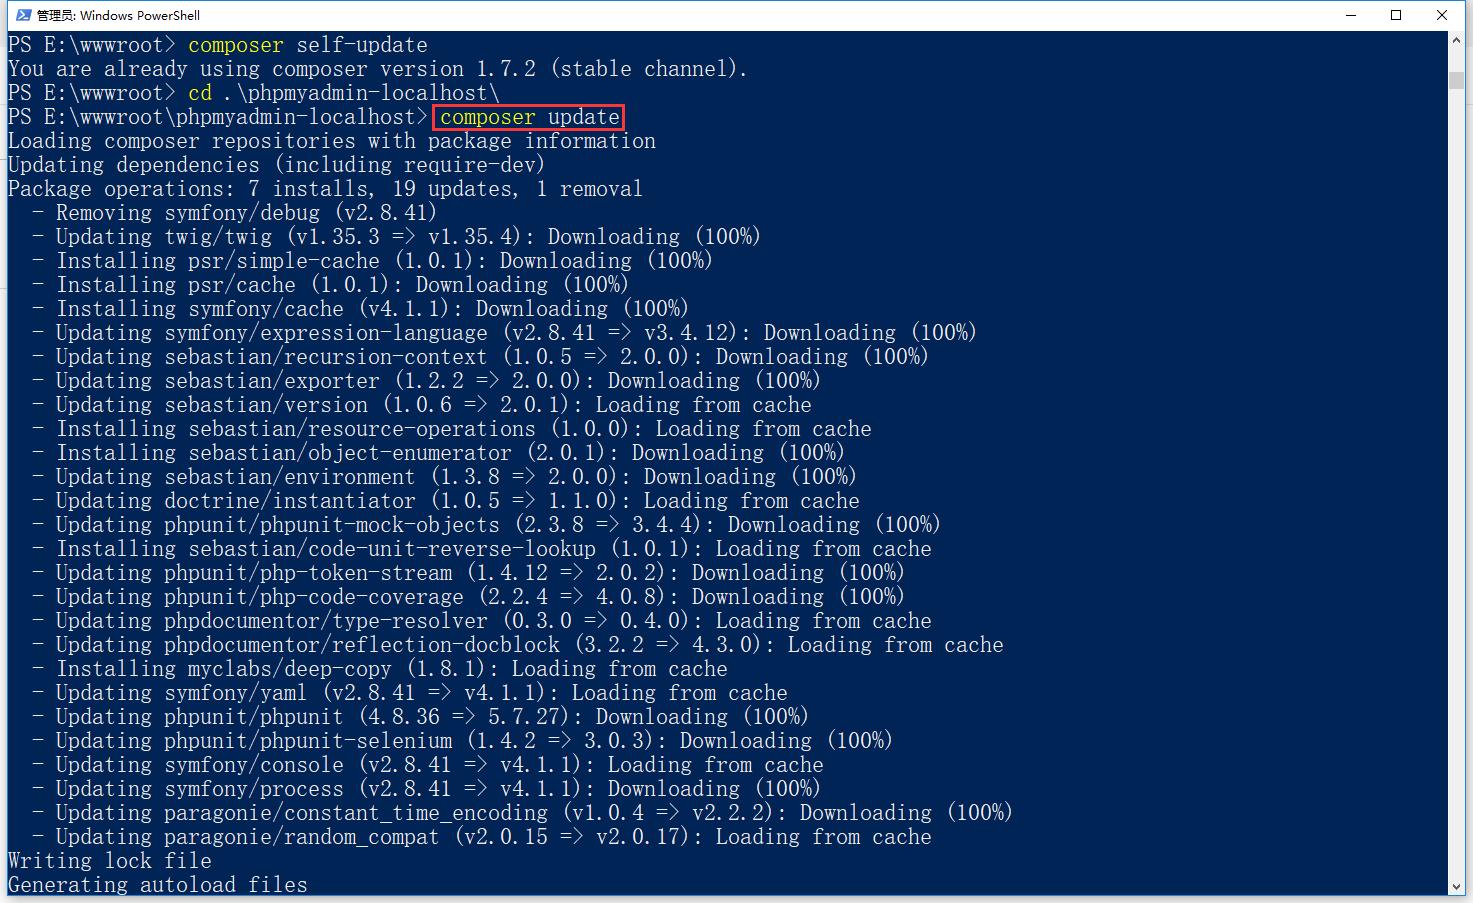 进入 phpmyadmin-localhost 目录,更新 phpMyAdmin 至最新版本,运行命令